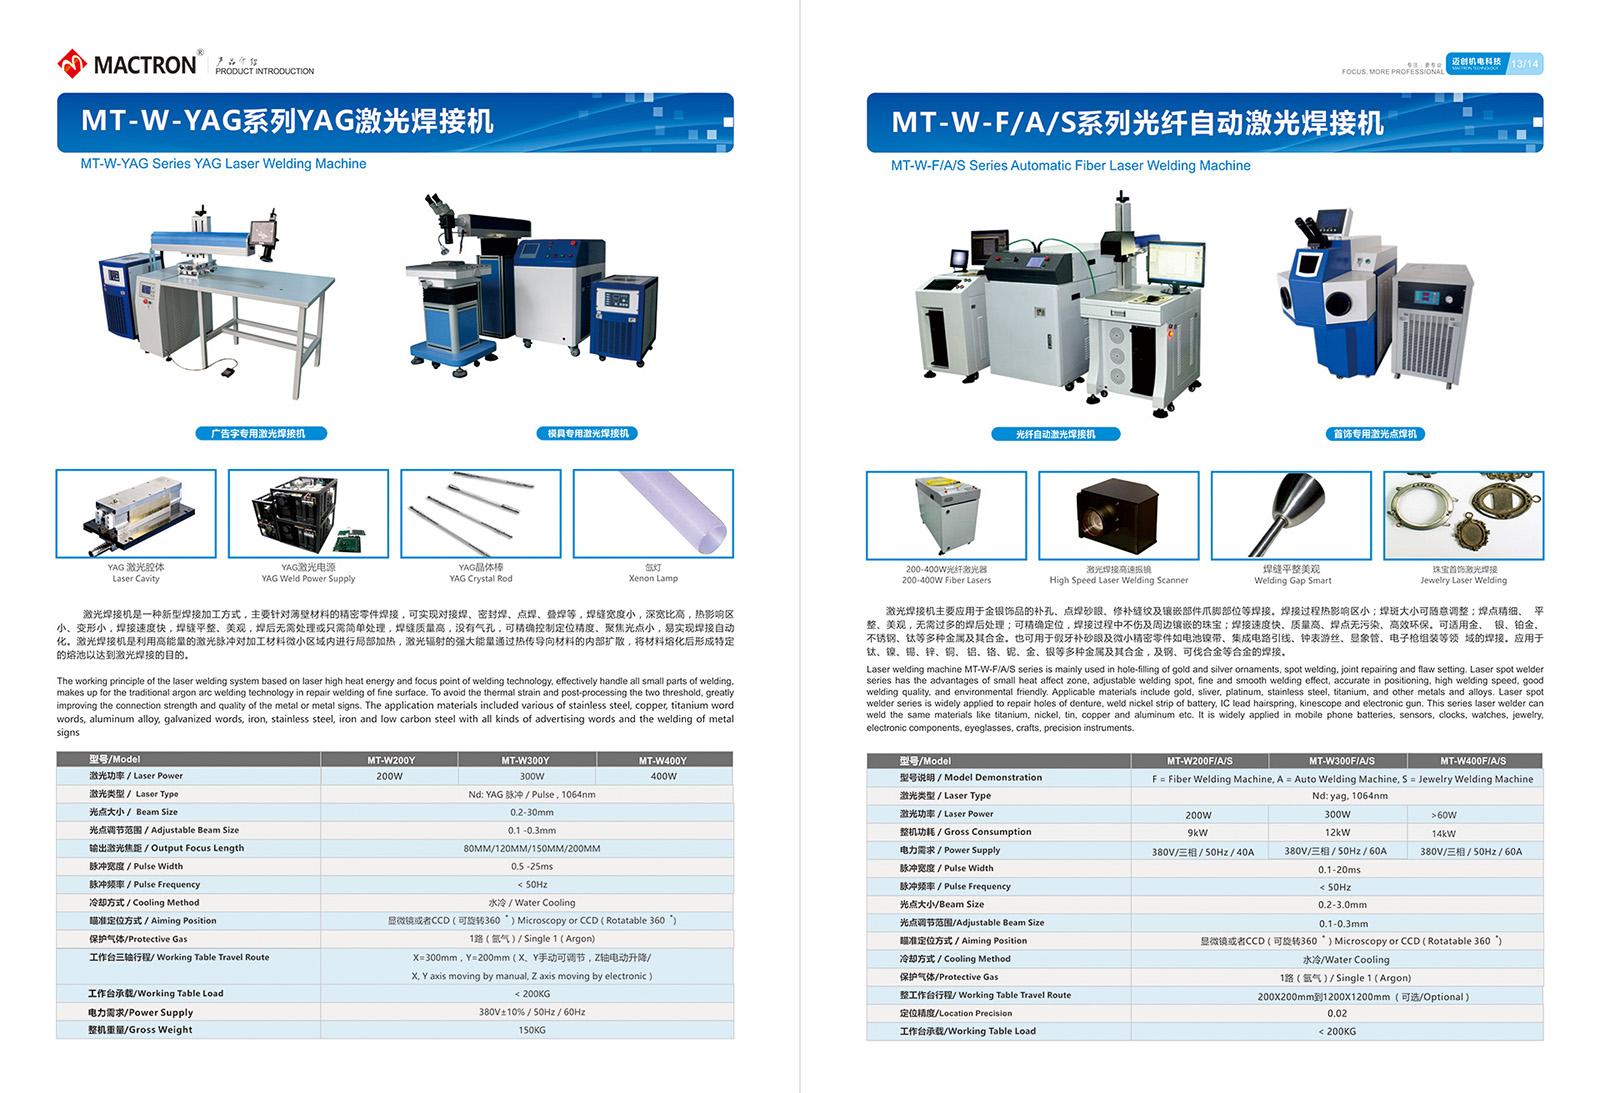 Mactron Tech Laser Catalogue 2017 (8)